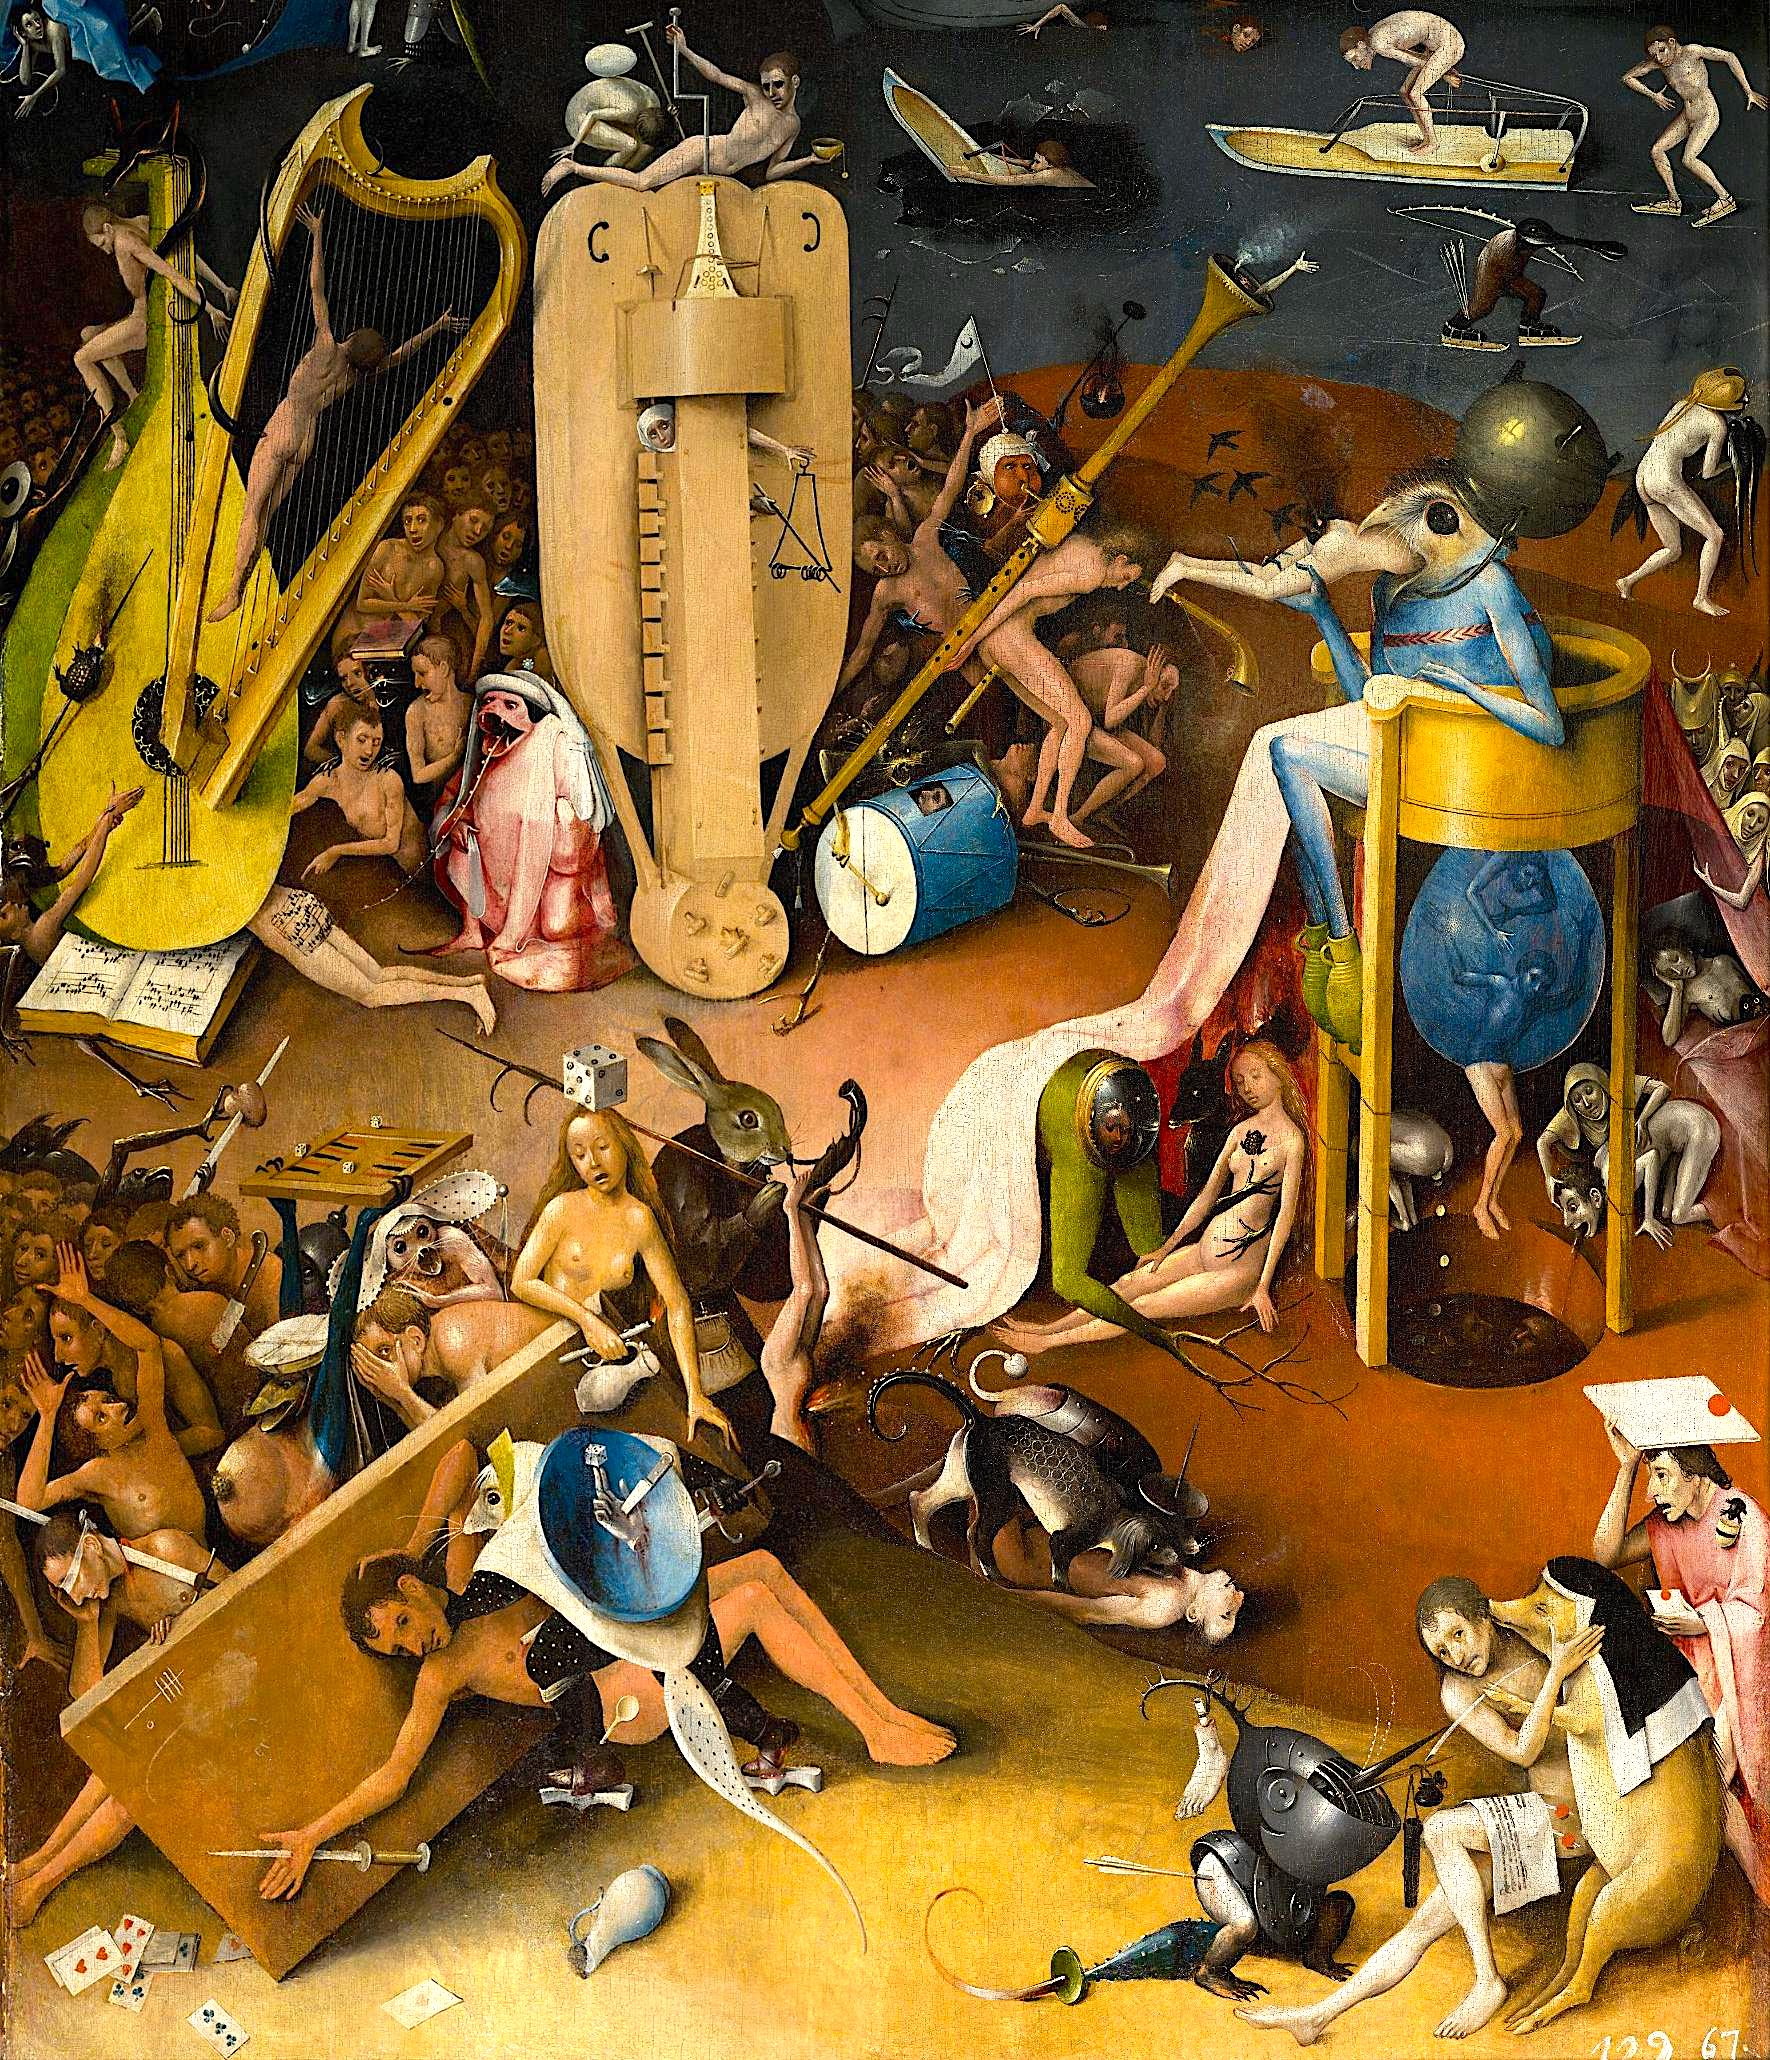 Hieronymus Bosch - Pjese nga Triptiku Kopeshti i Hijeshive